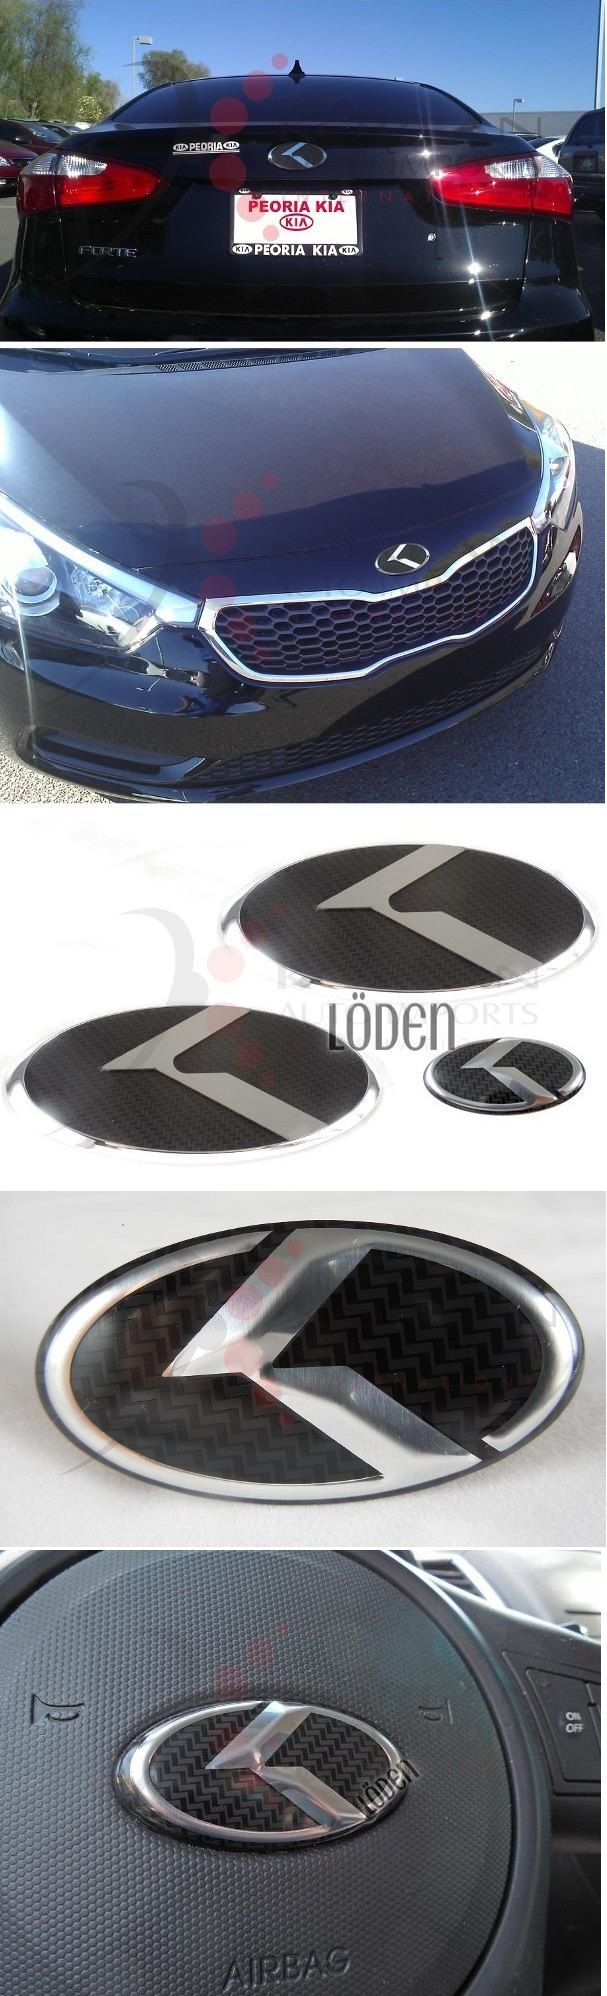 2012 soul carbon stainless 3pc set k emblem badge grill trunk